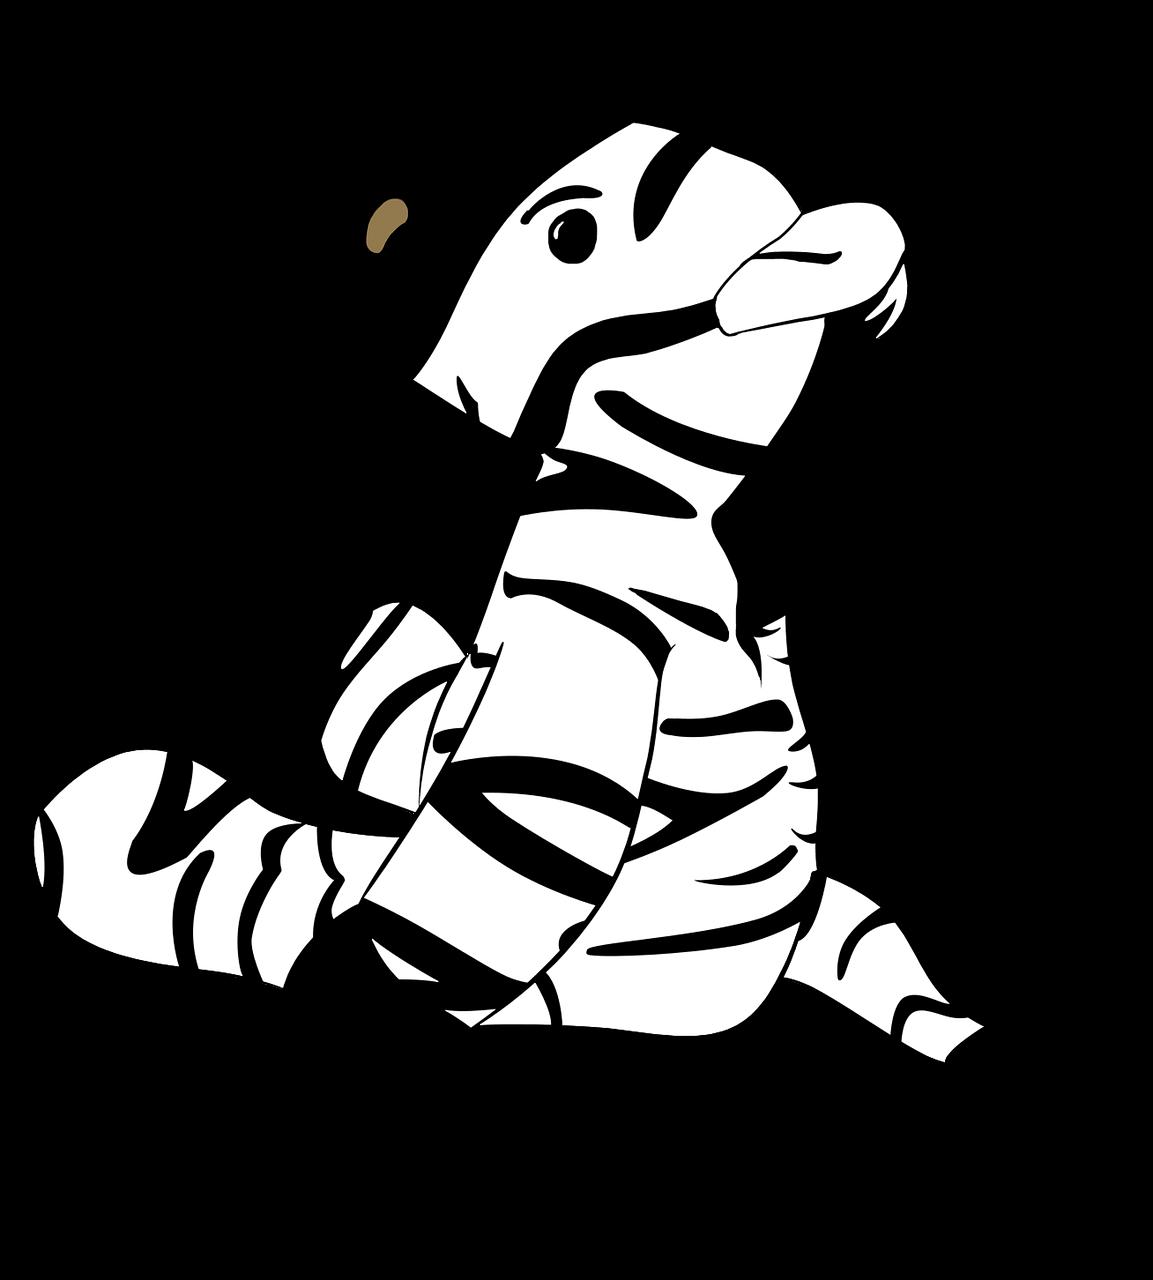 Zebra Hewan Kartun Gambar Gratis Di Pixabay